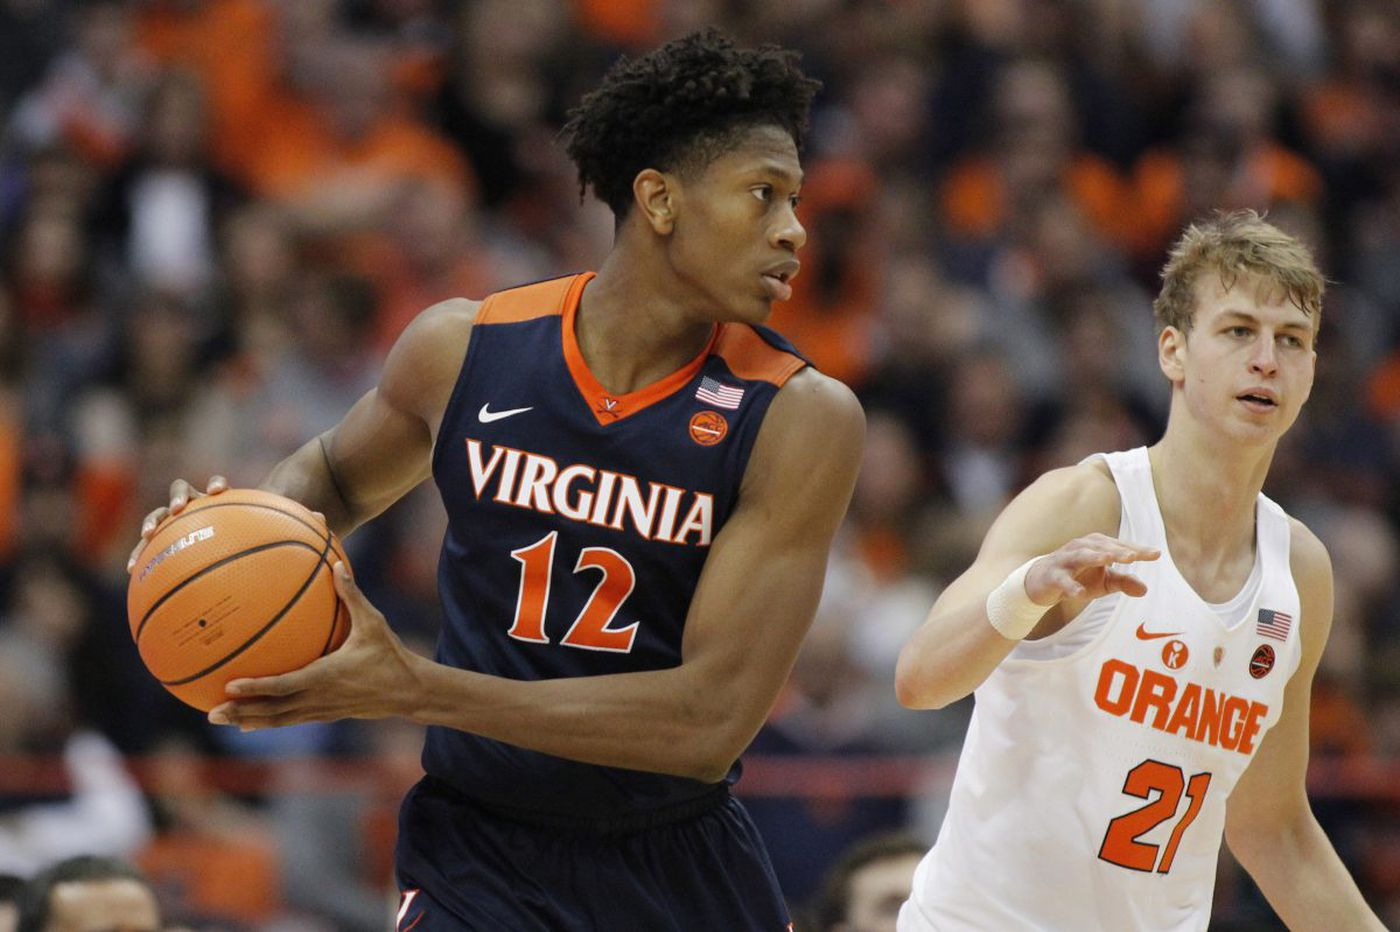 Virginia on track to replace Villanova atop rankings | College Hoops Topics